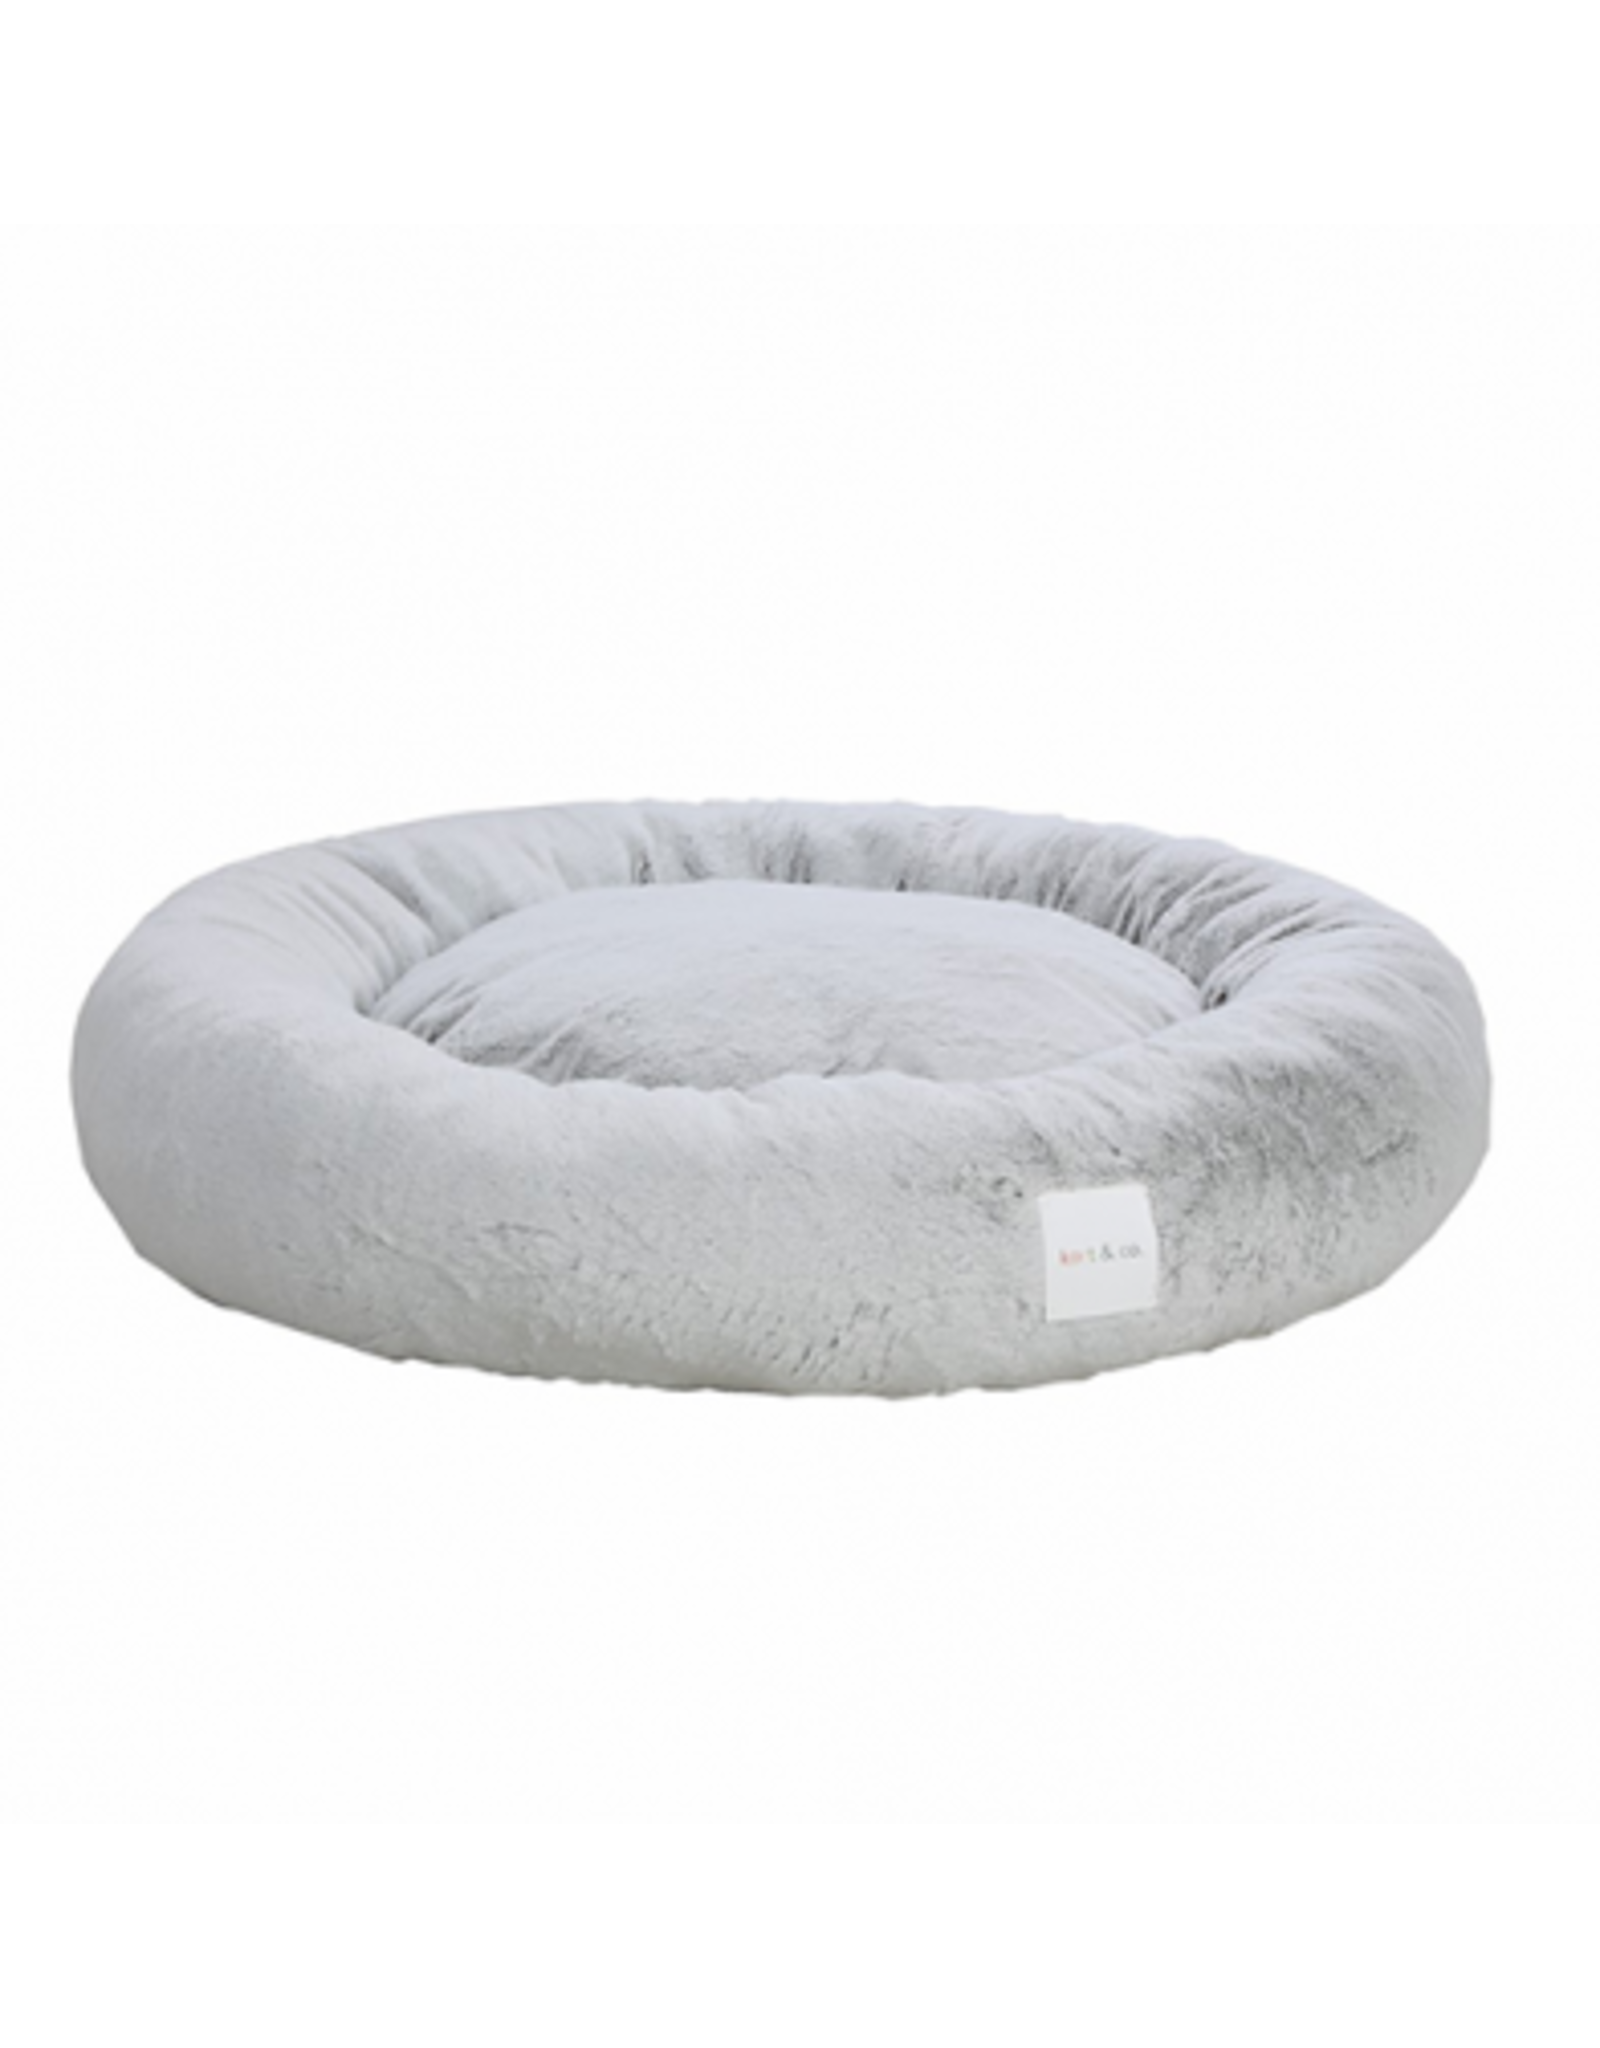 "KORT & CO Kort + Co - Faux Fur - Round Bed 42"" (XL)"